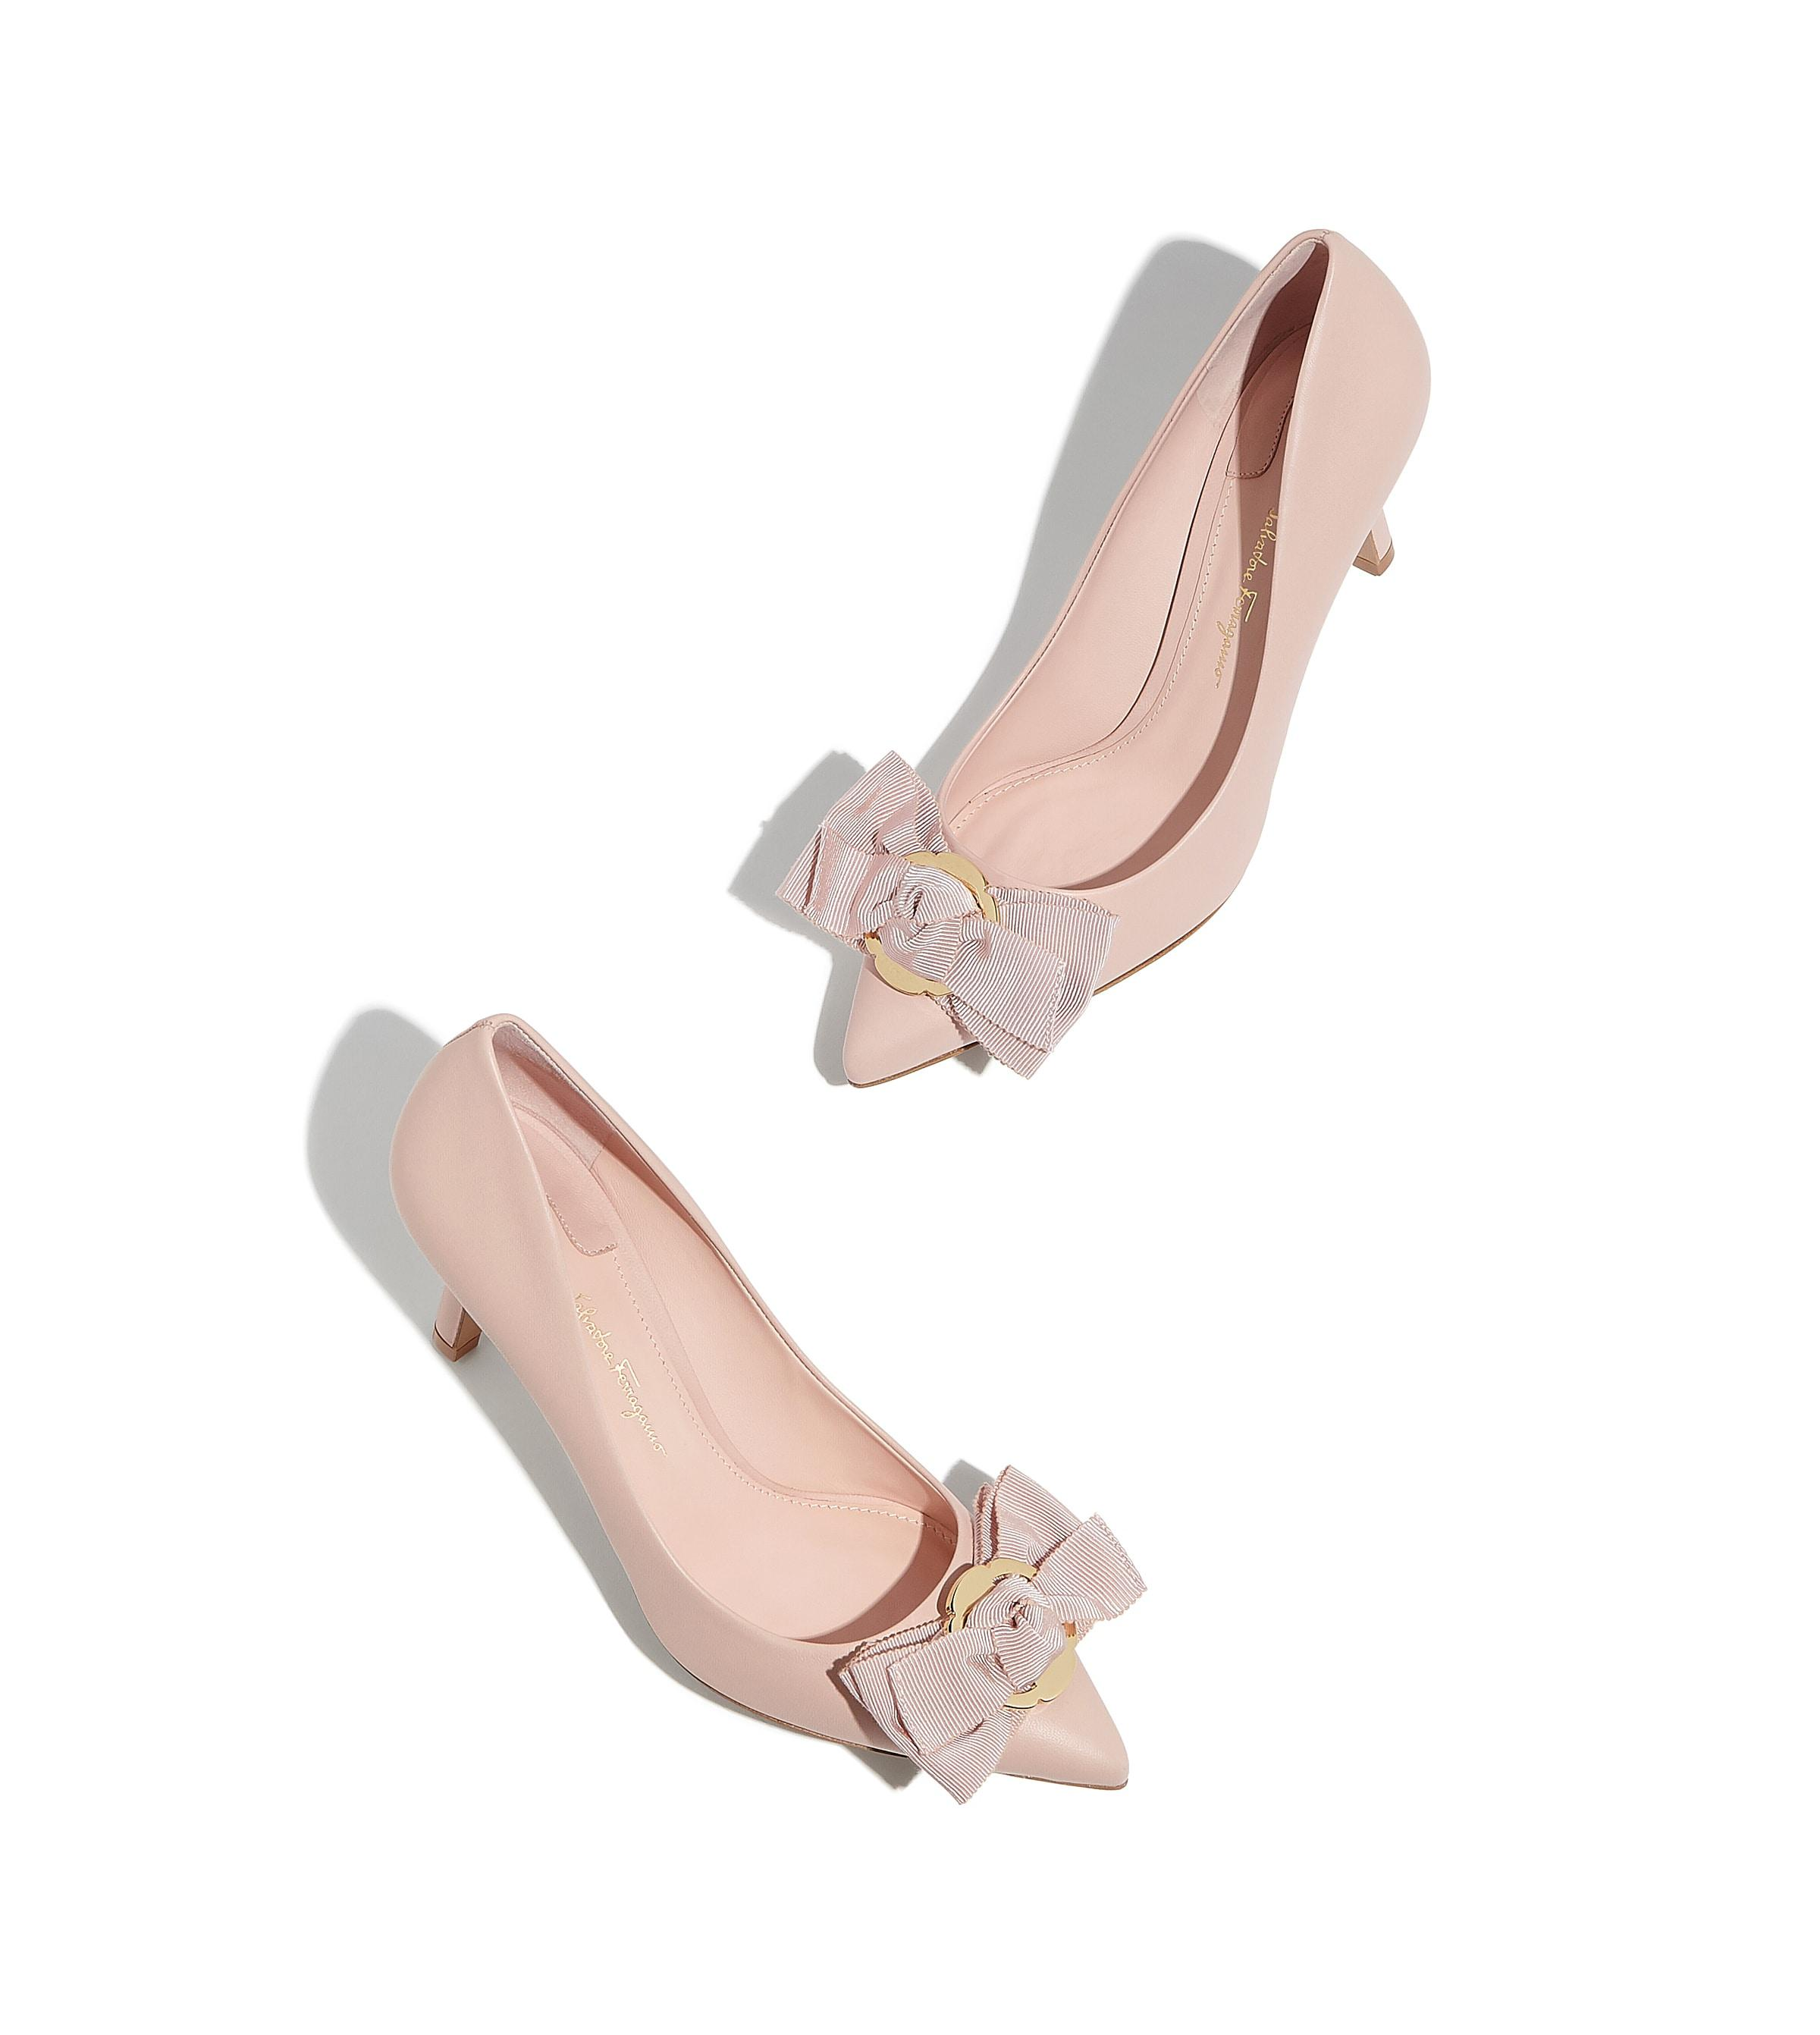 2471985cbe2 Lyst - Ferragamo Peony Bow Pump Shoe in Pink